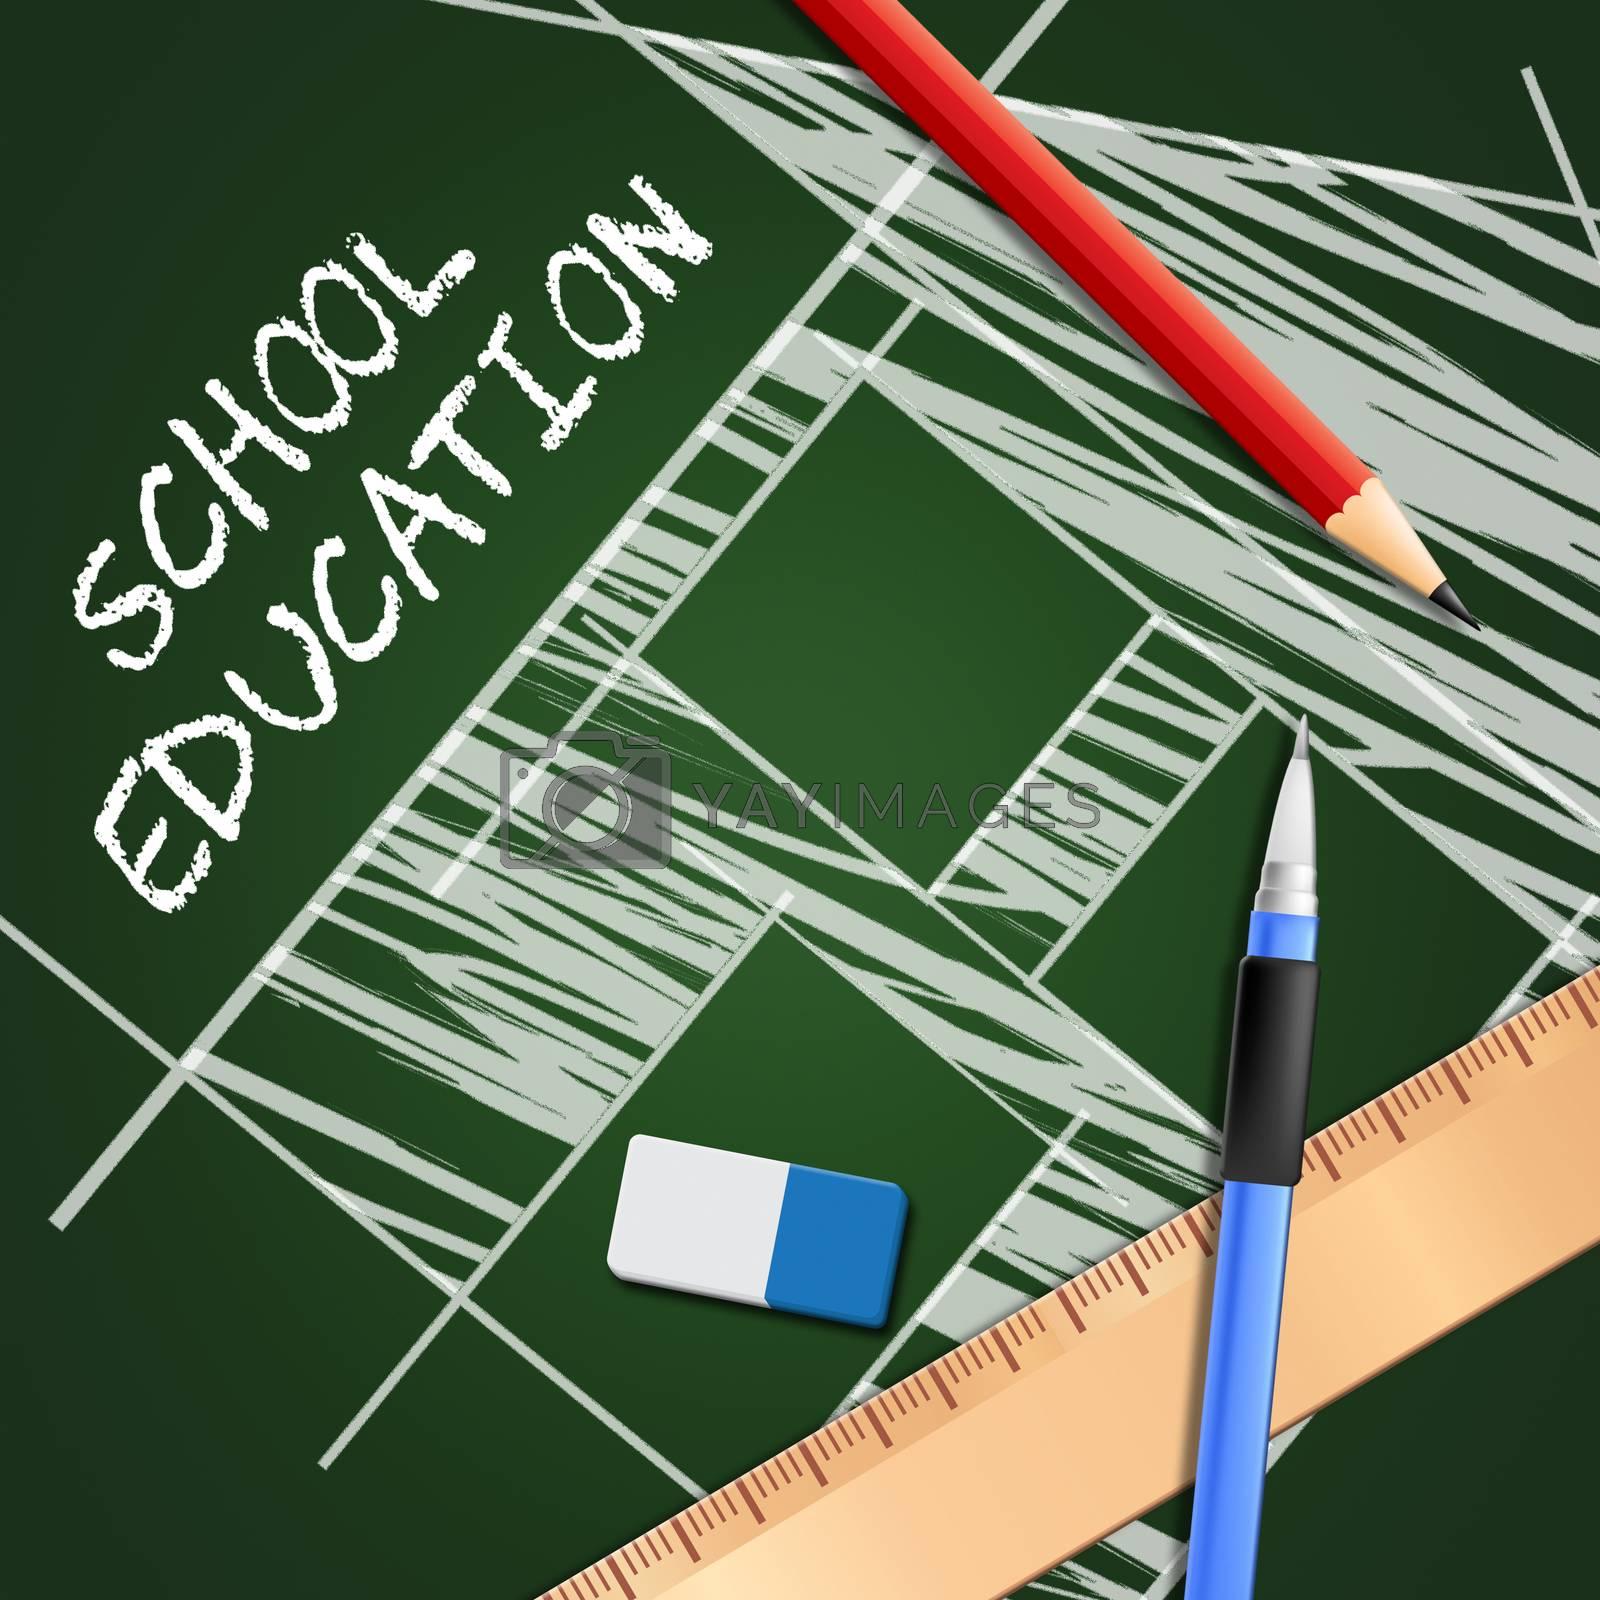 School Education Equipment Showing Kids Education 3d Illustration